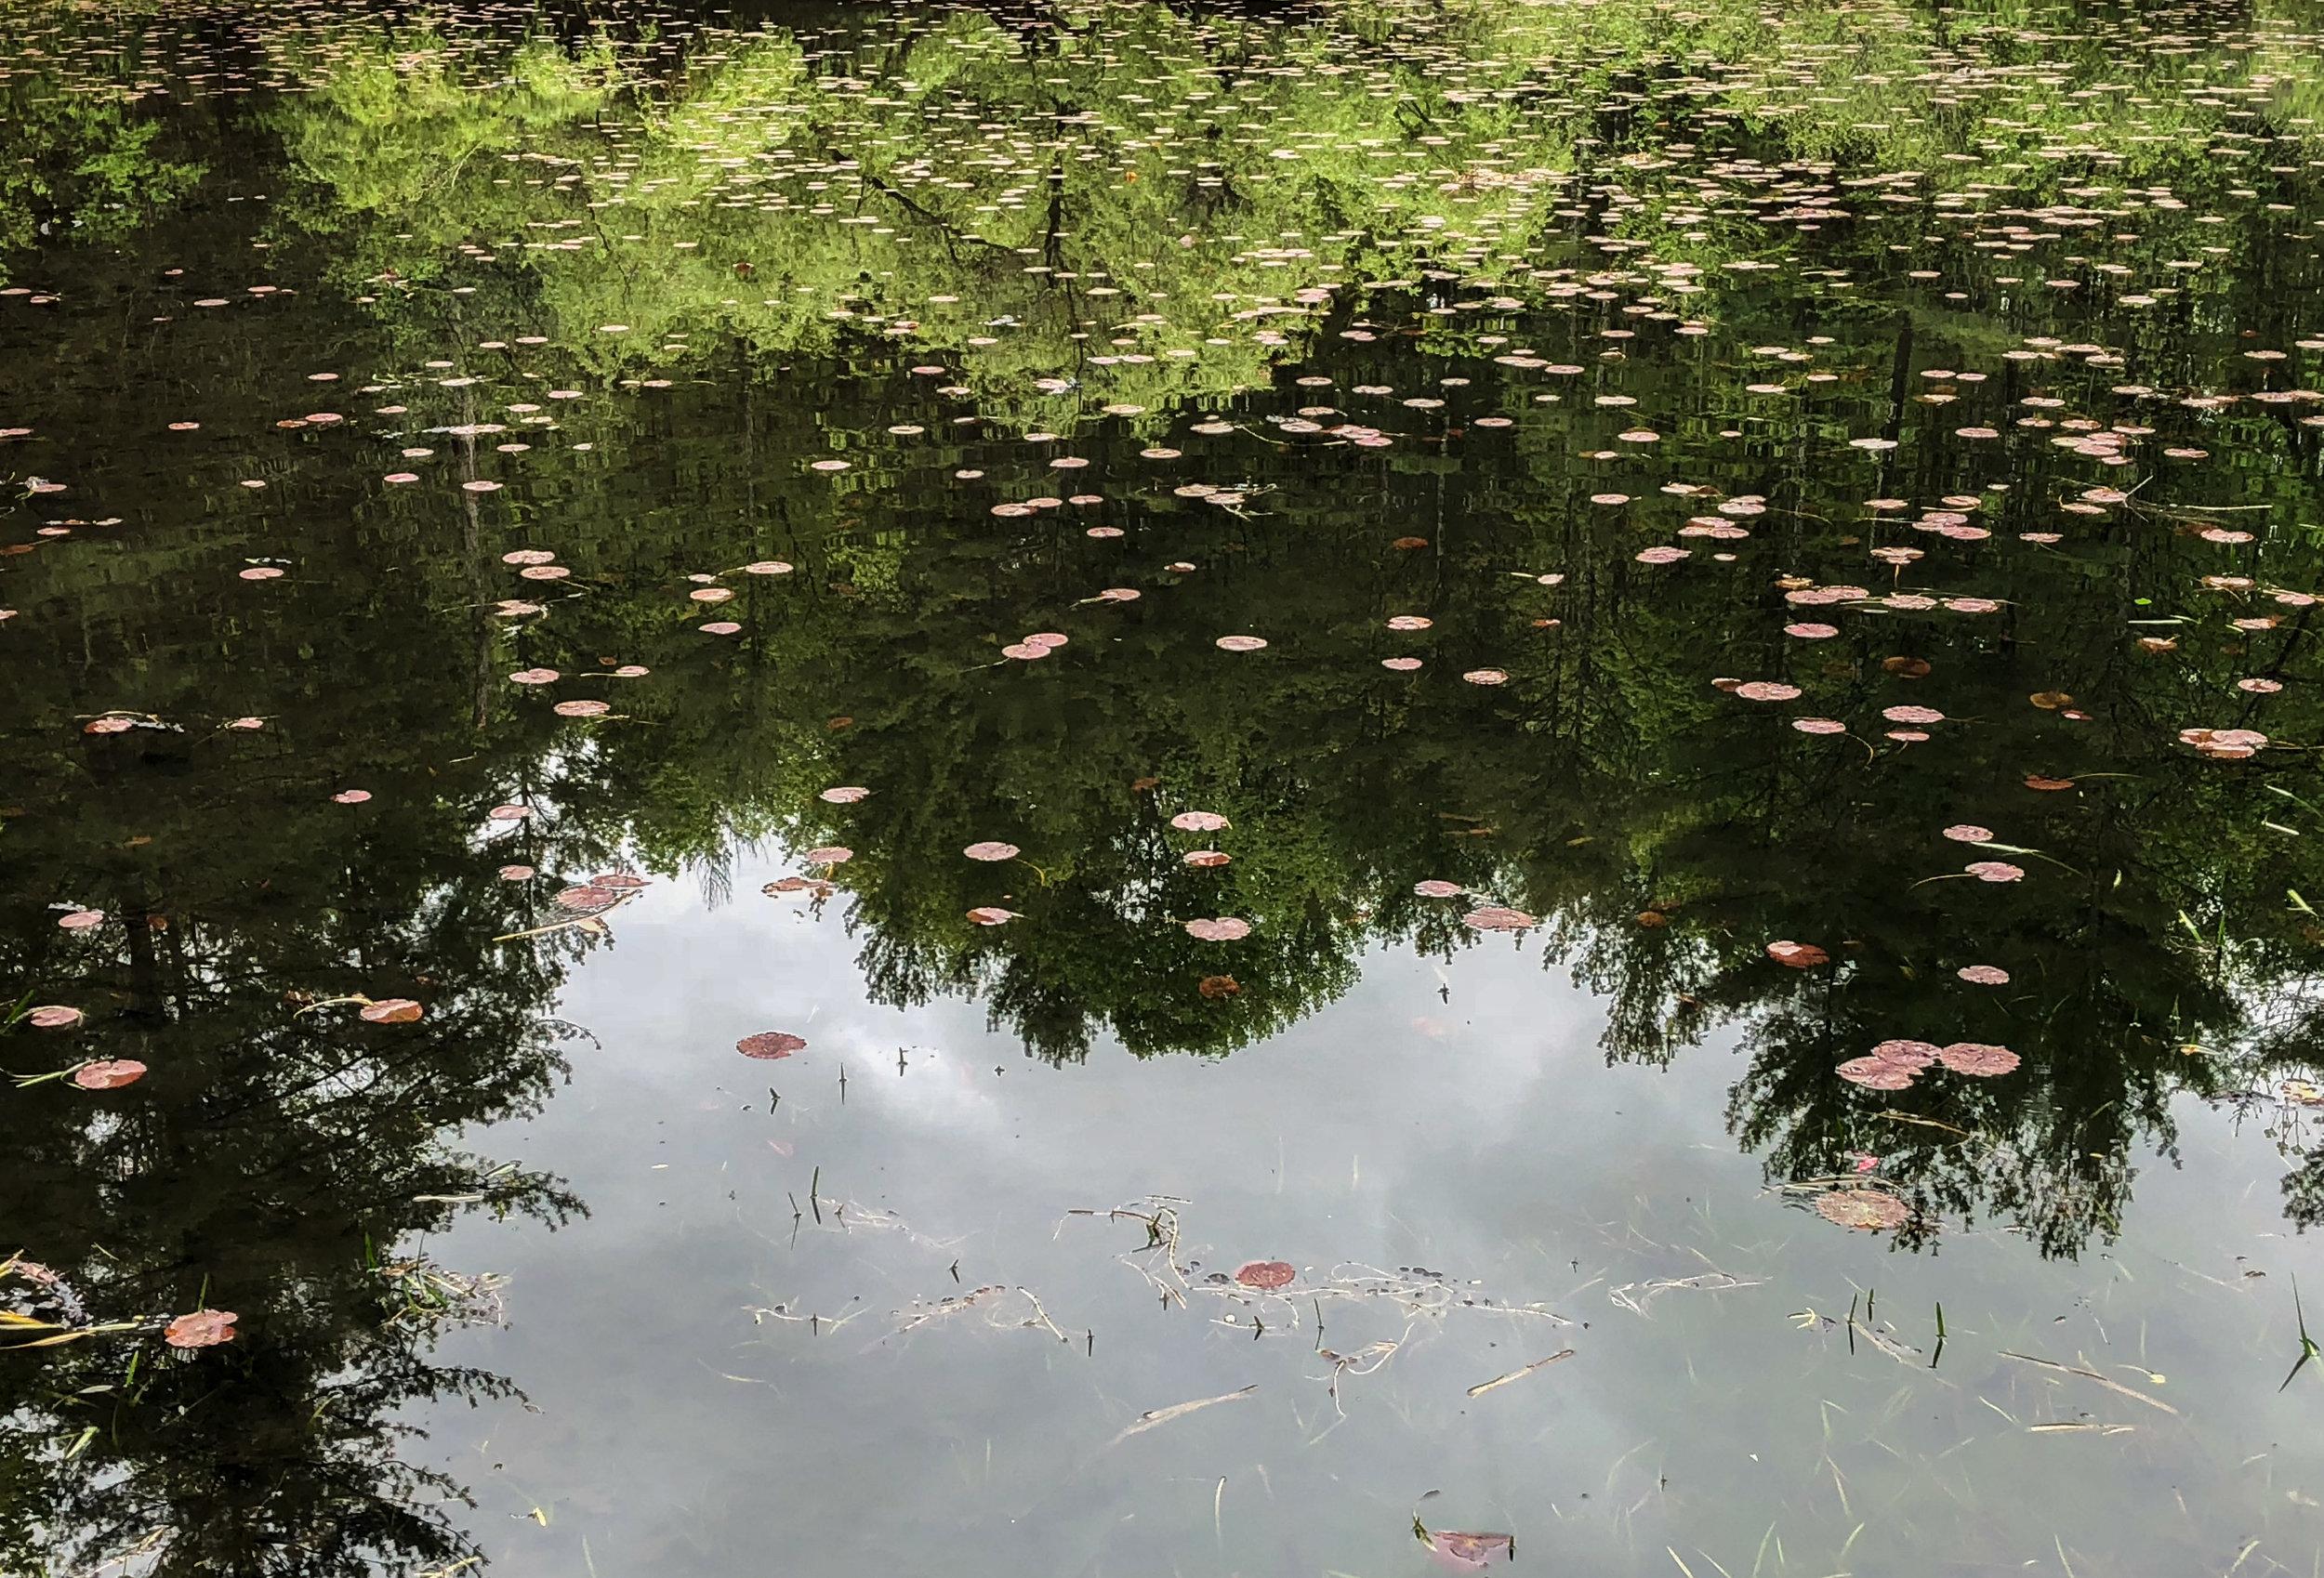 IMG_0185.Pond reflection.jpg